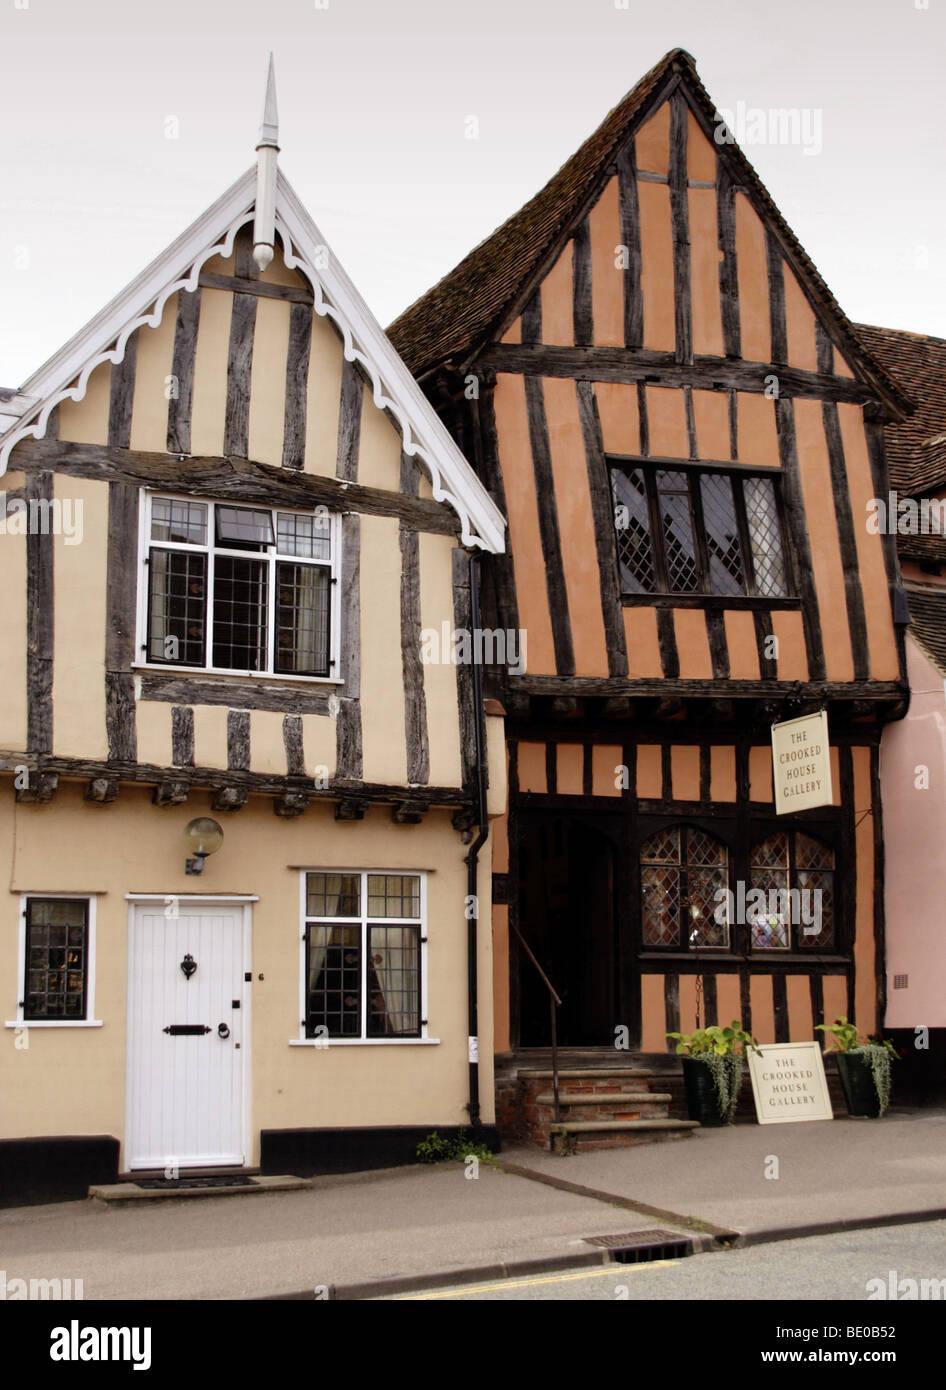 Crooked House, Lavenham, Suffolk, England - Stock Image